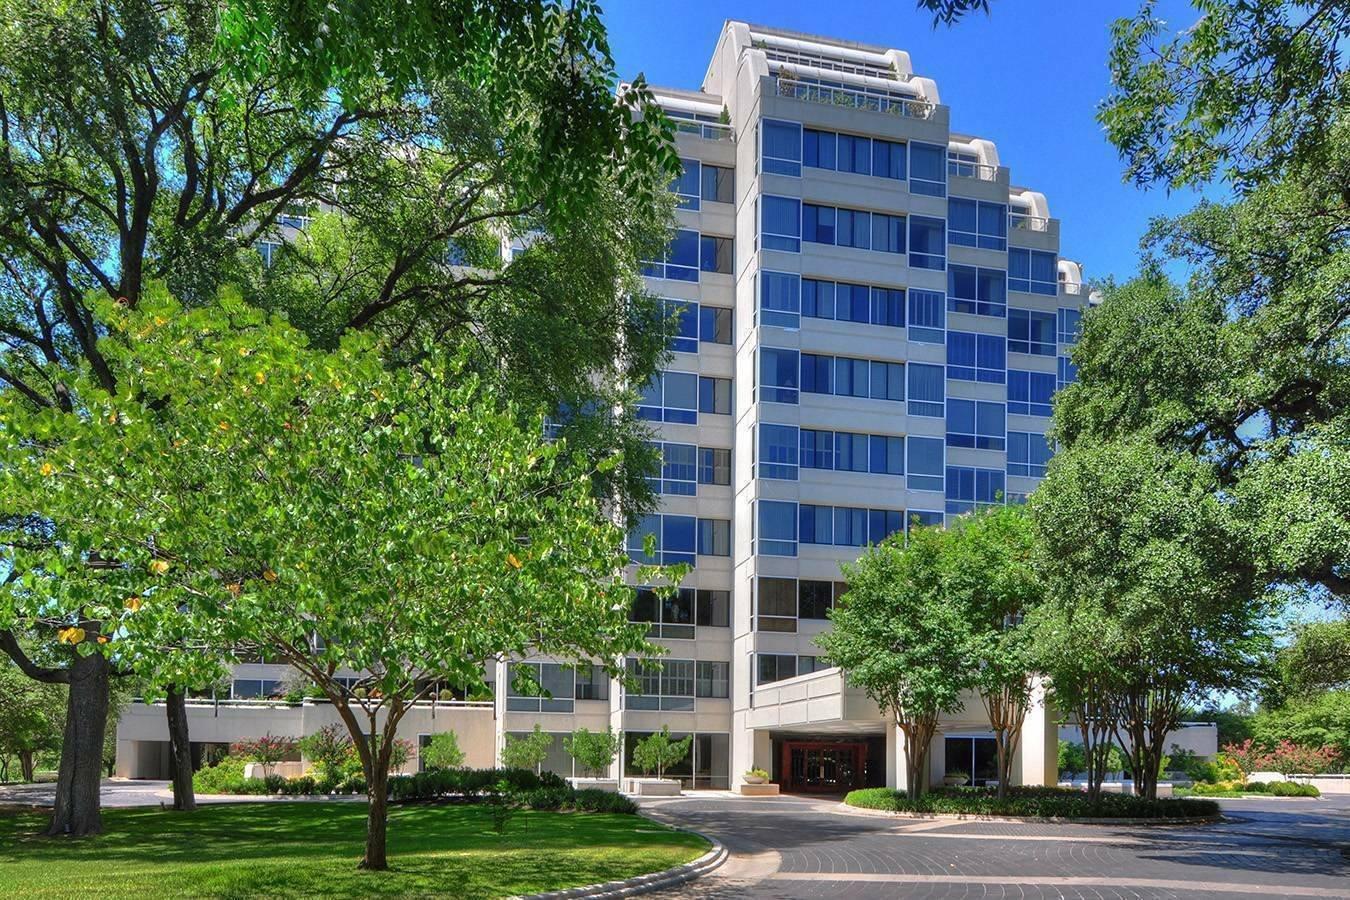 Condo in San Antonio, Texas, United States 1 - 11511790